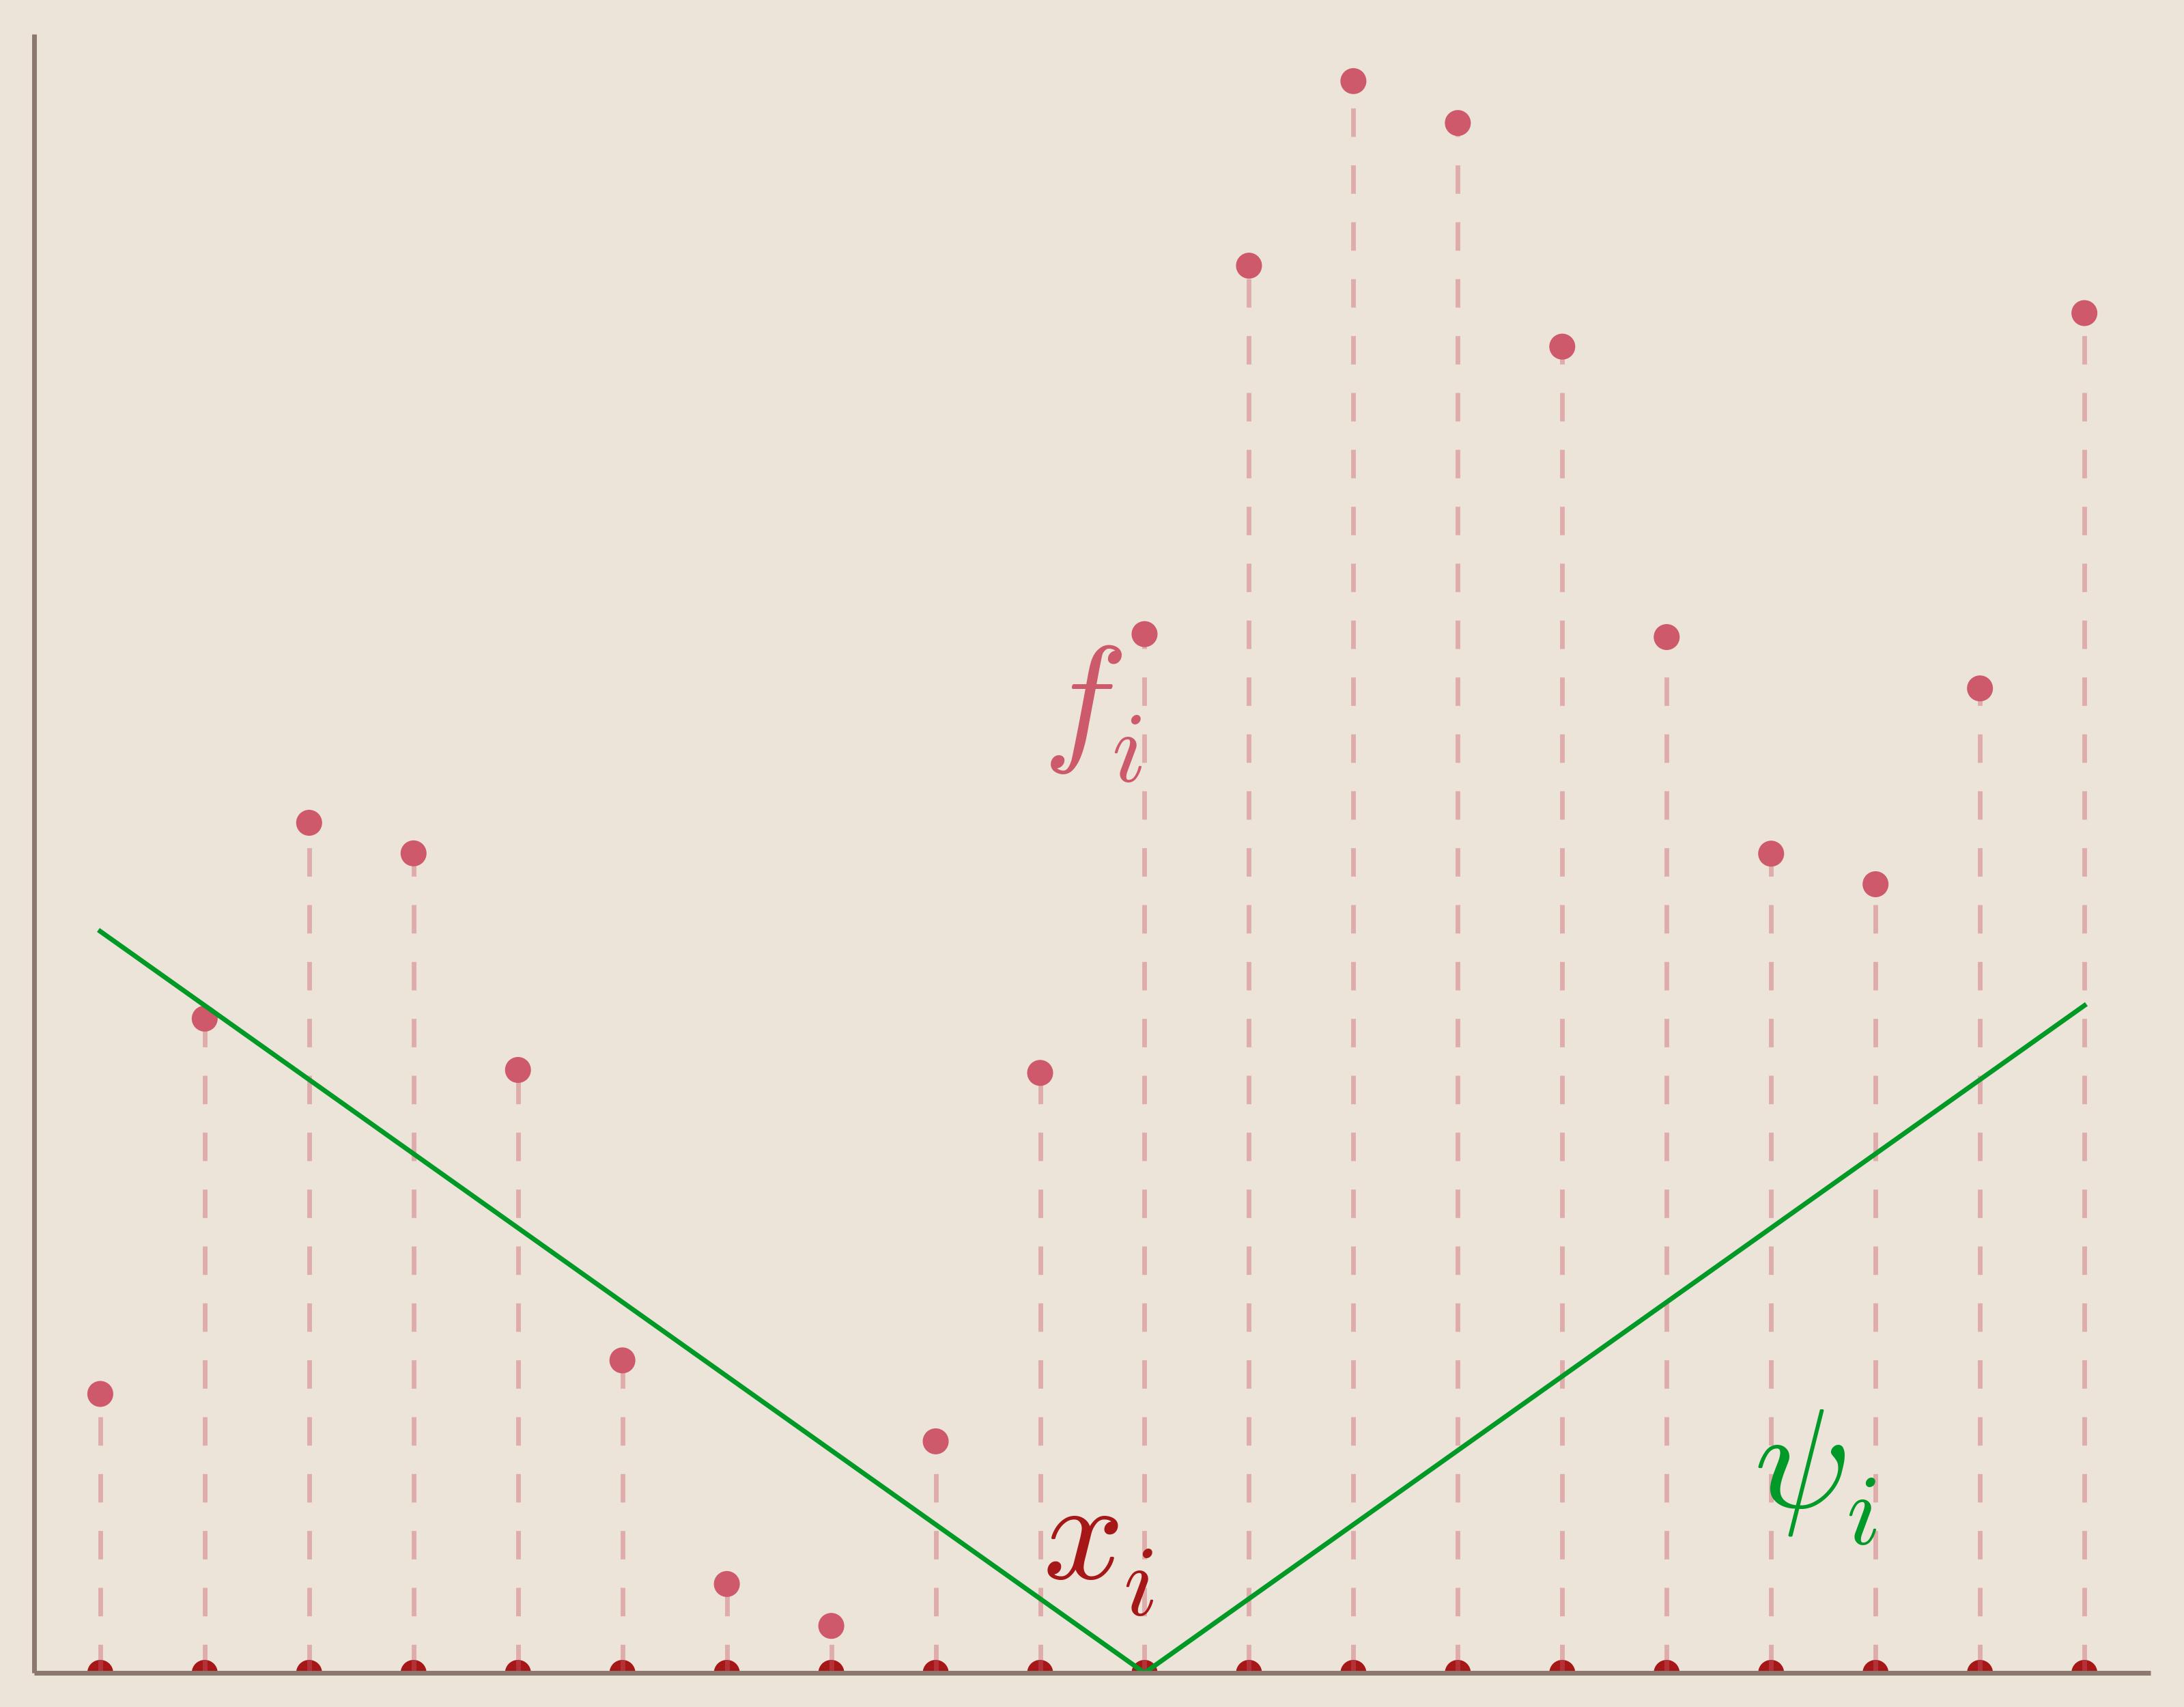 Radial Basis Interpolation by jessebett